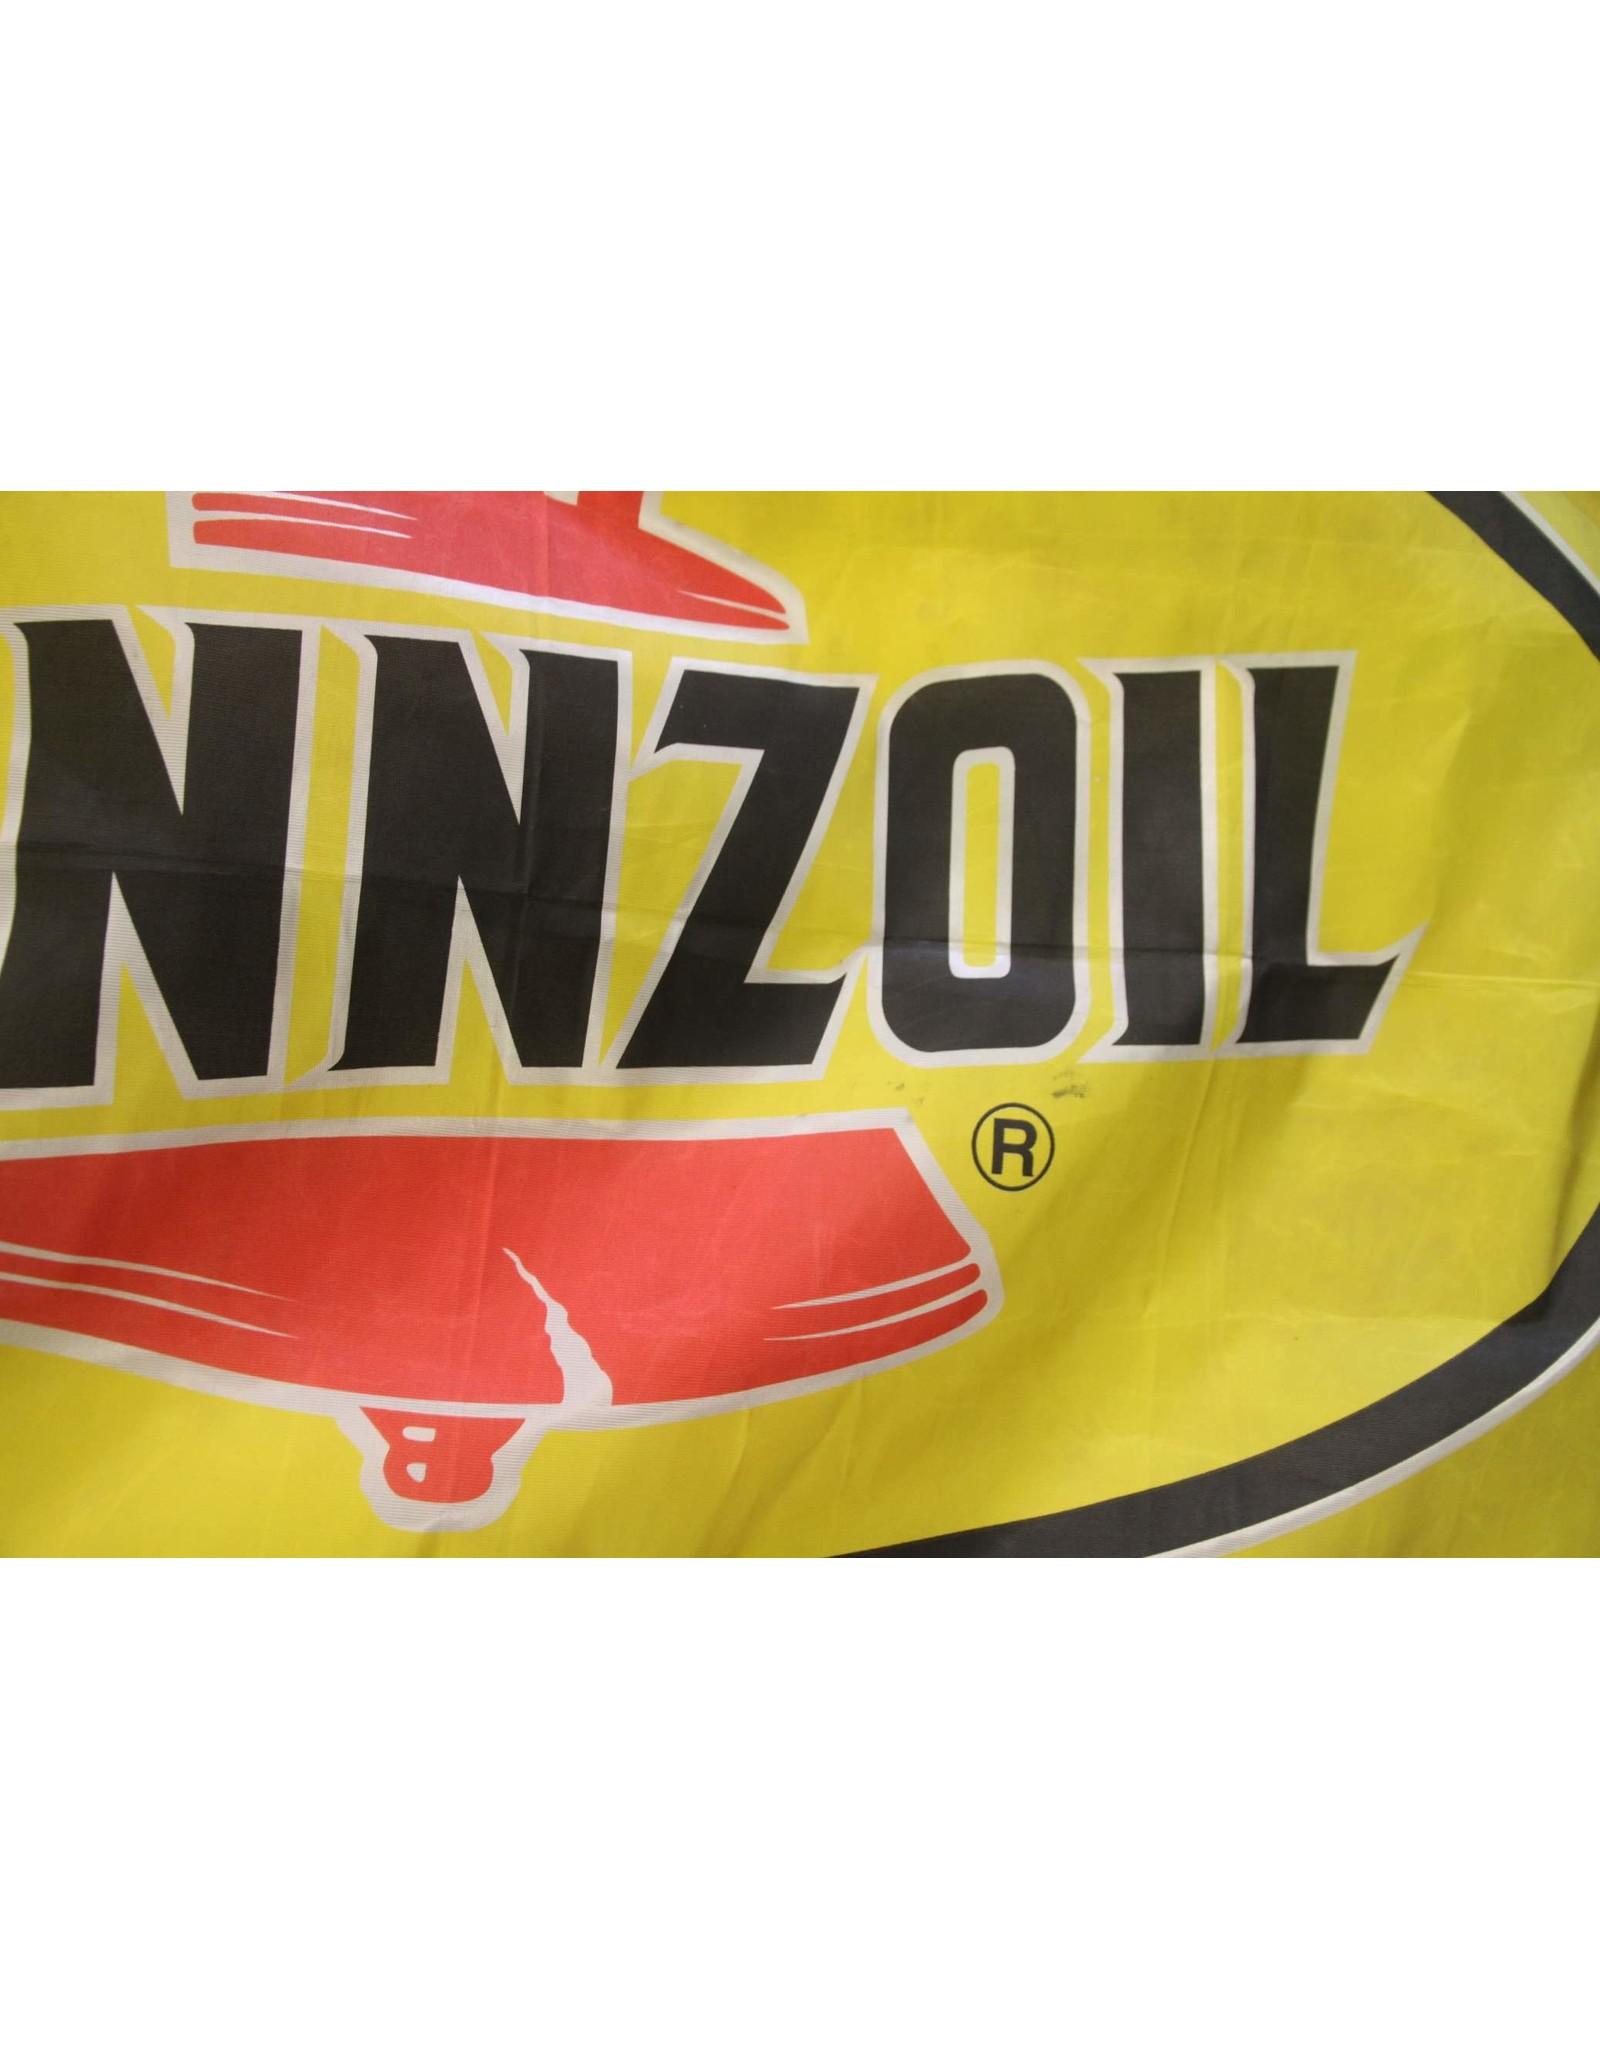 Pennzoil banner